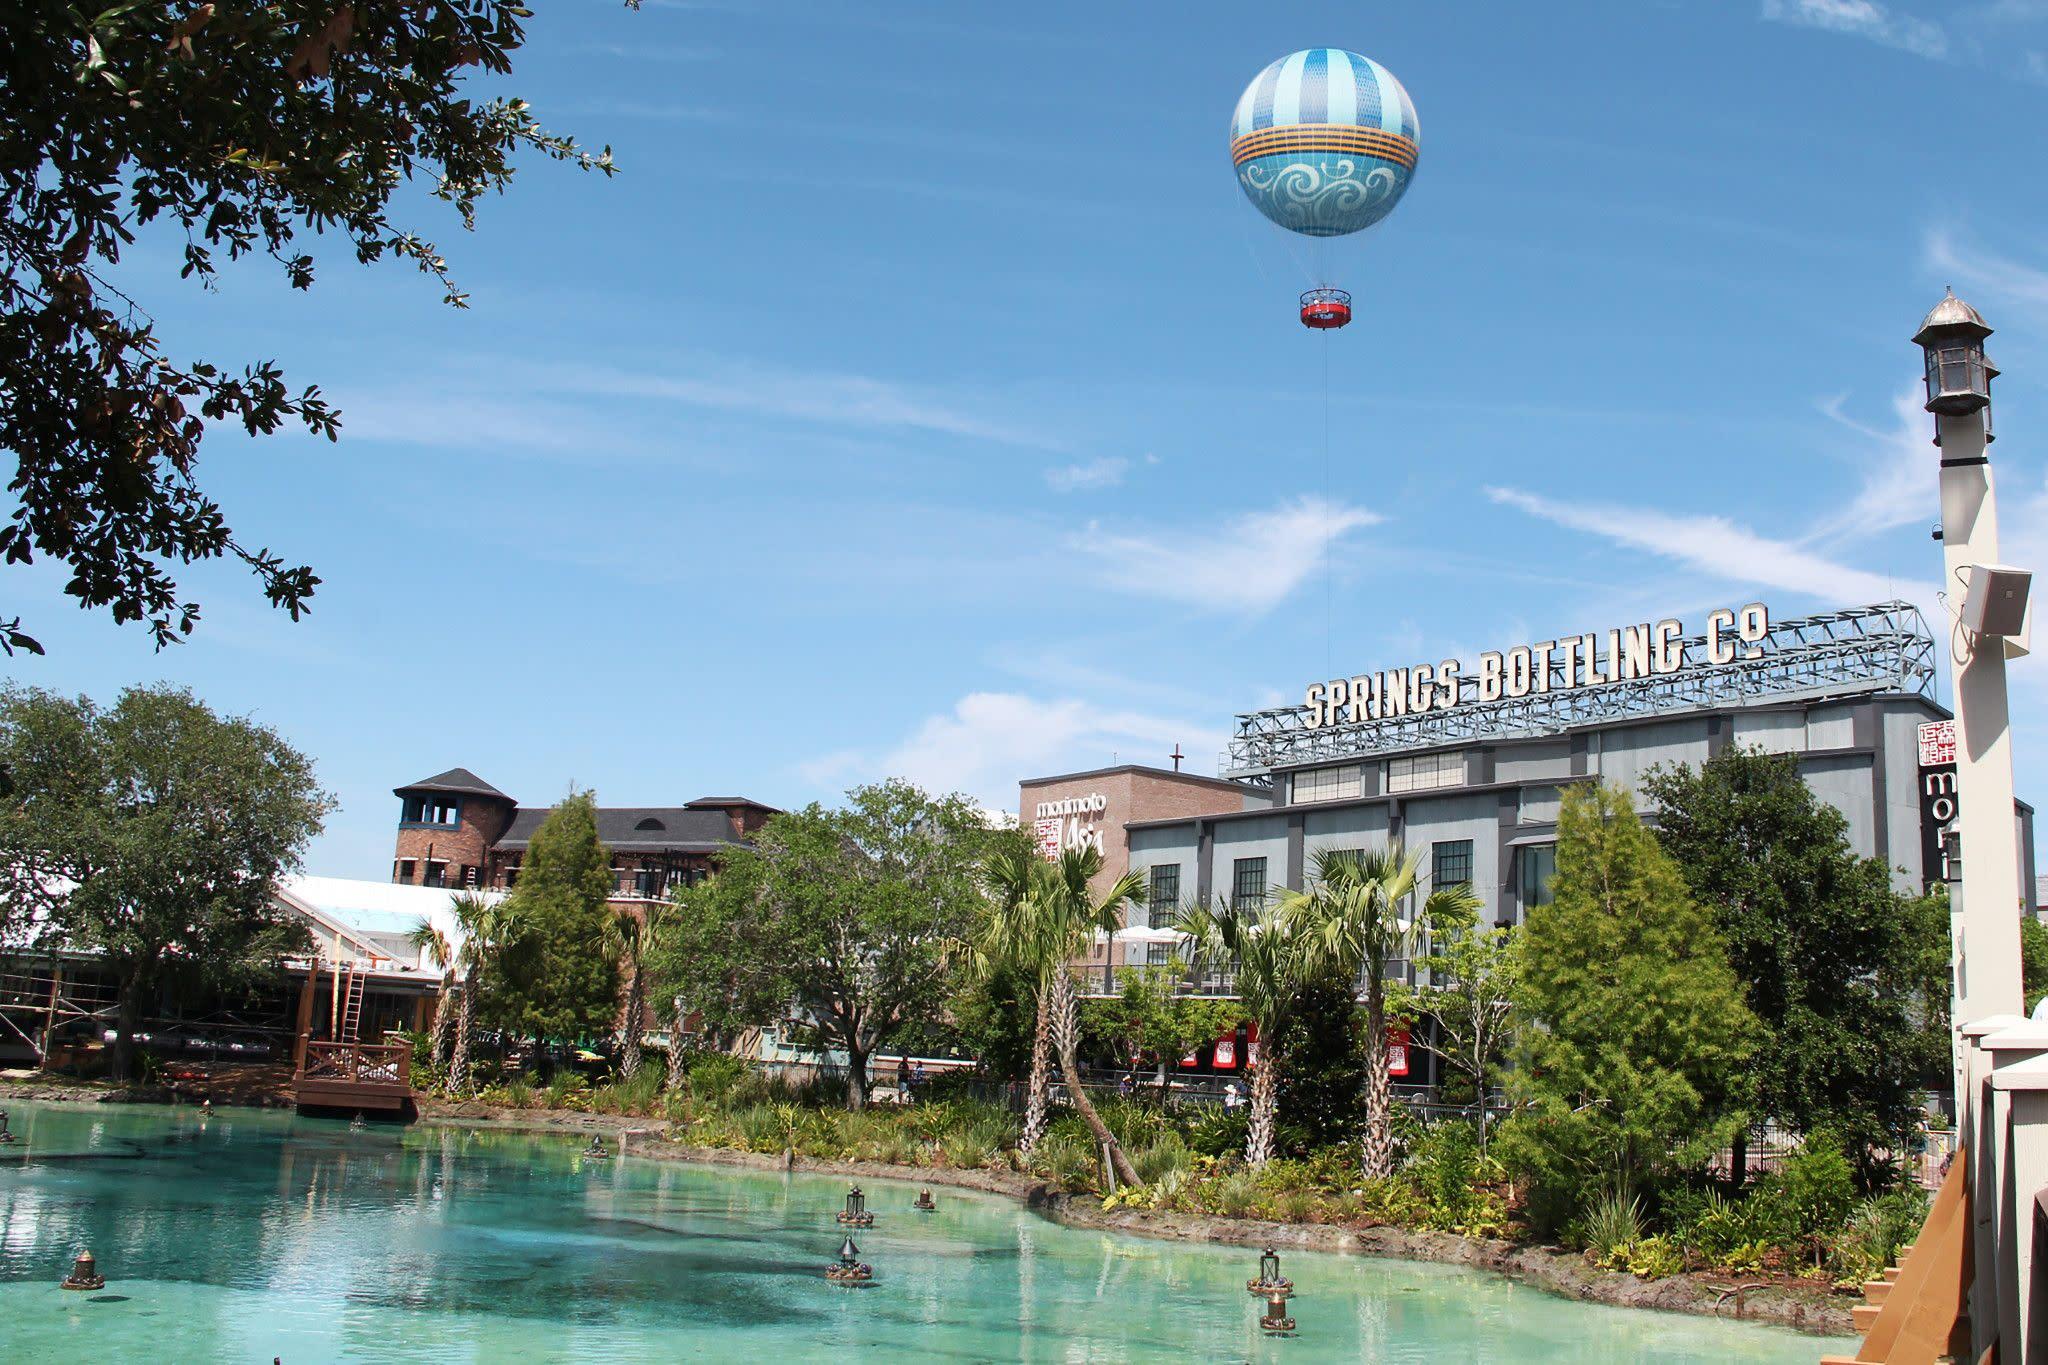 Aerophile Balloon at Disney Springs in Orlando